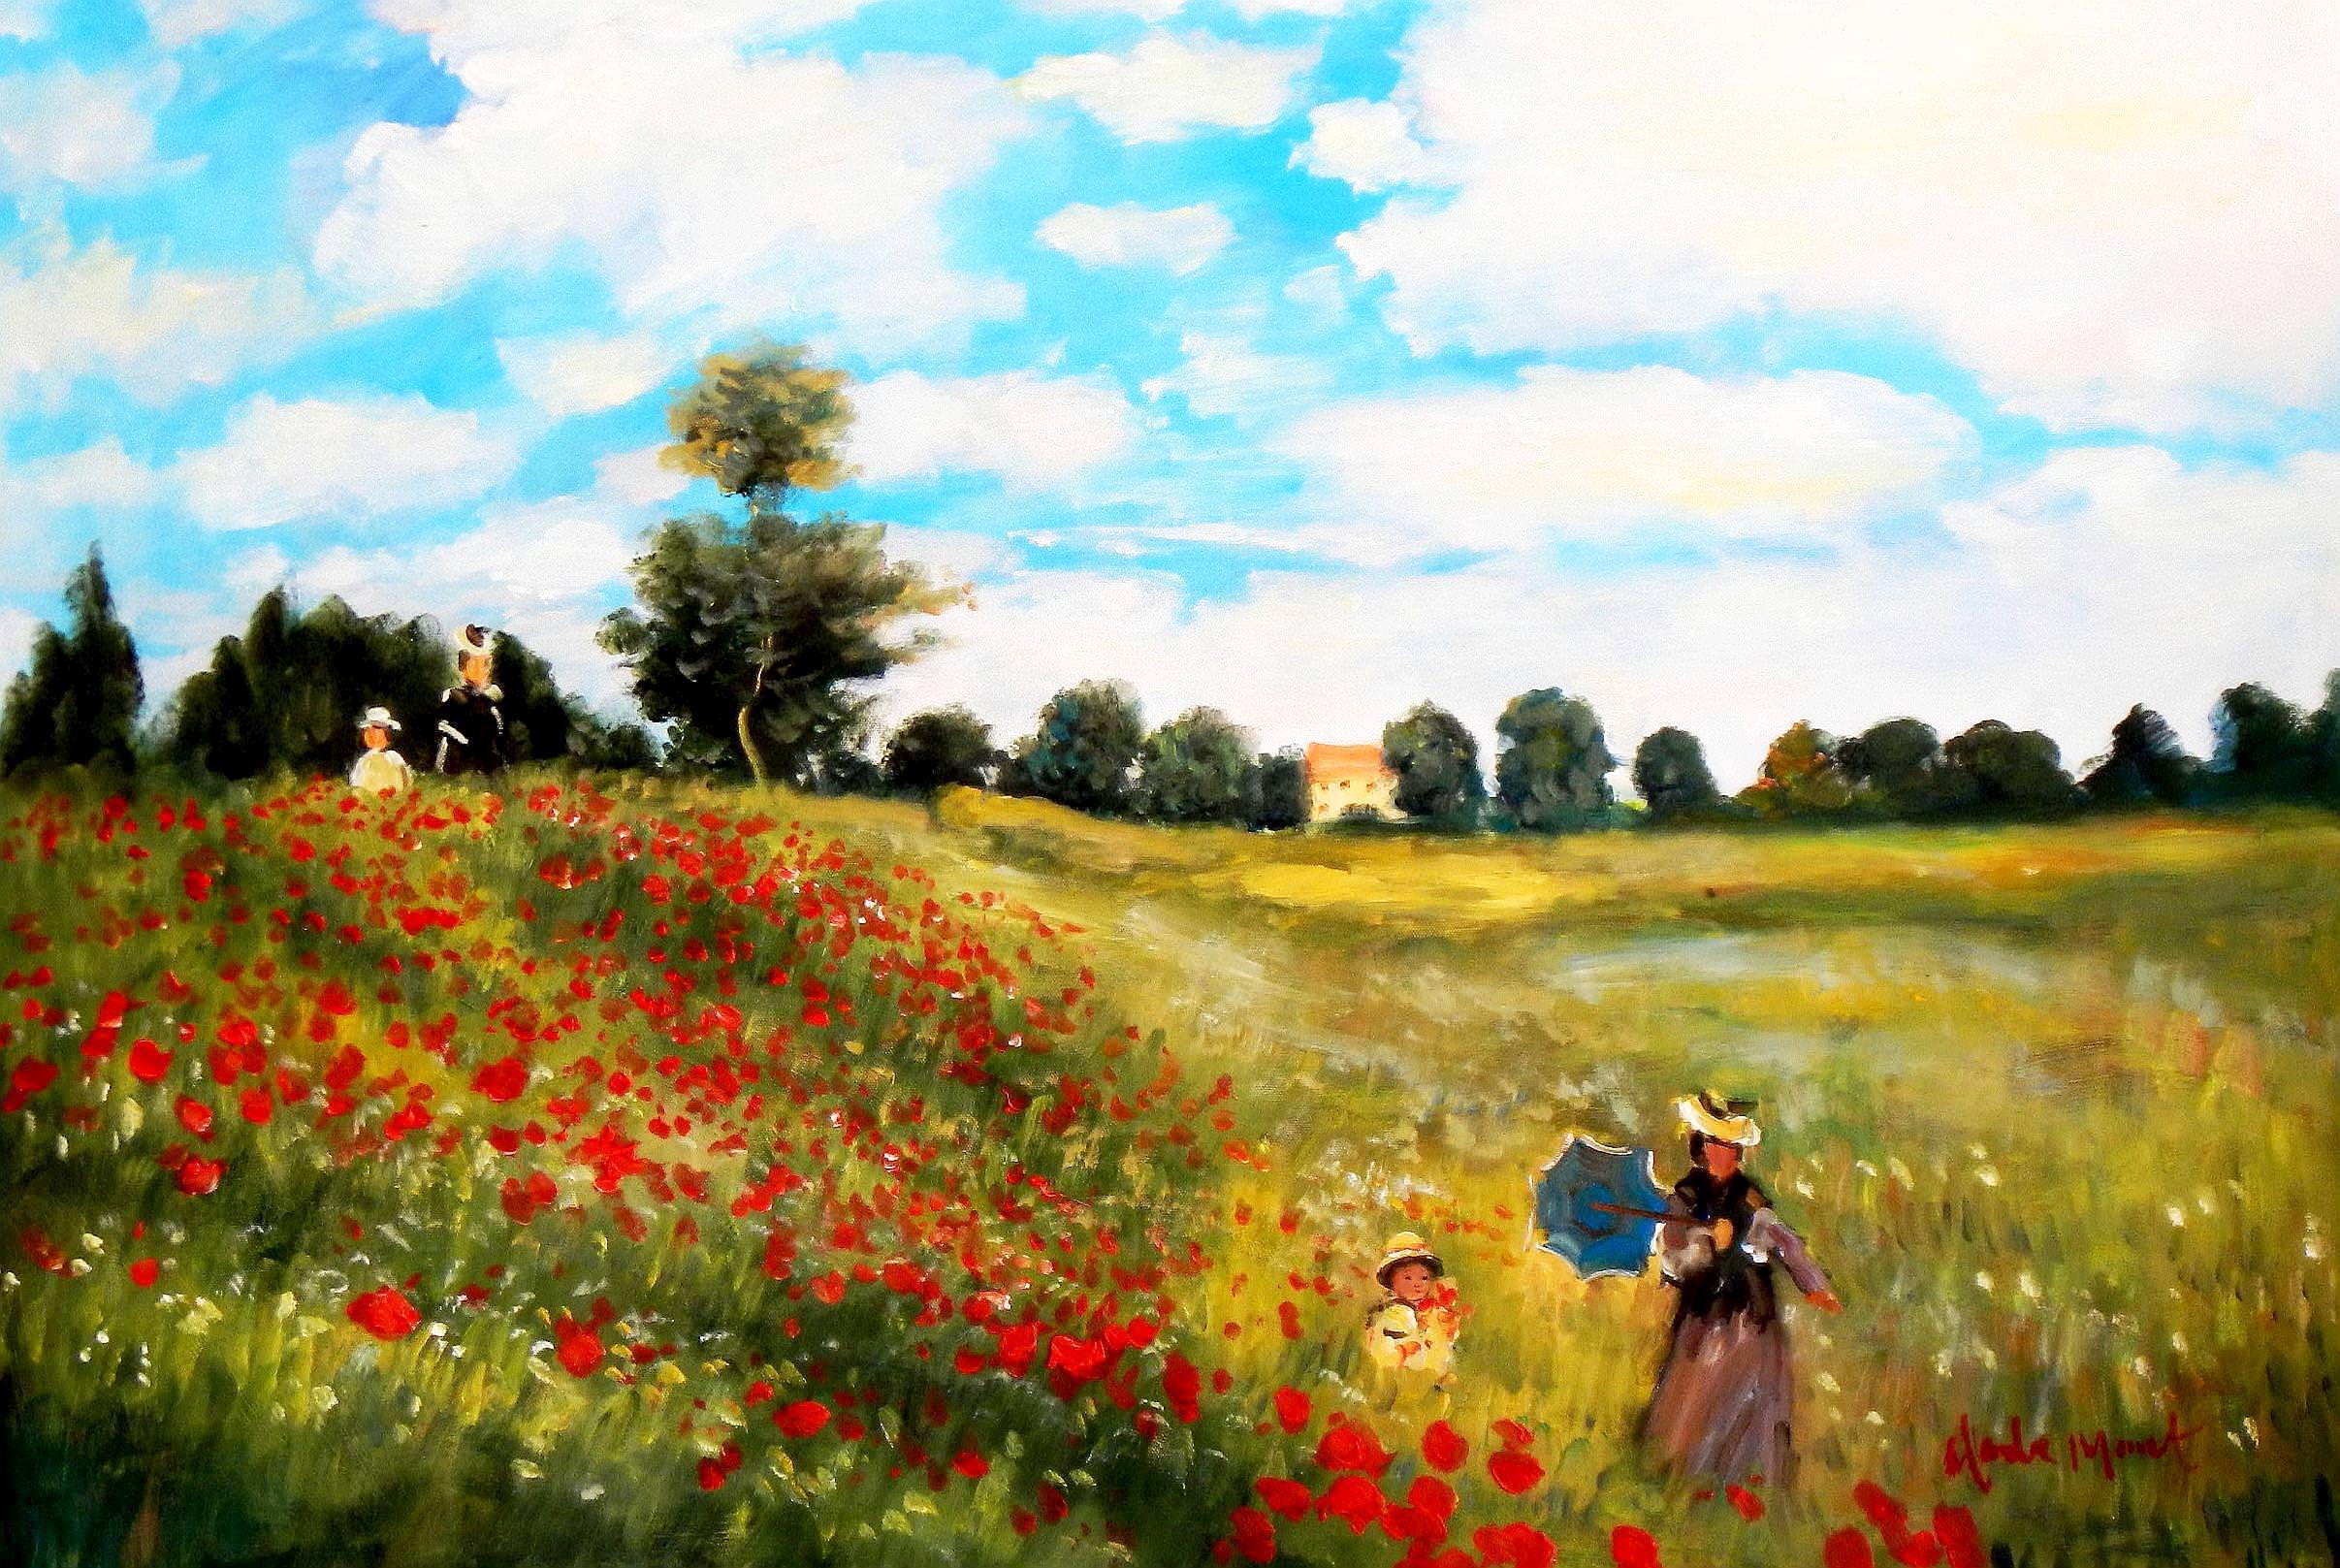 Claude Monet - Mohnfeld bei Argenteuil d93933 60x90cm exzellentes Ölbild